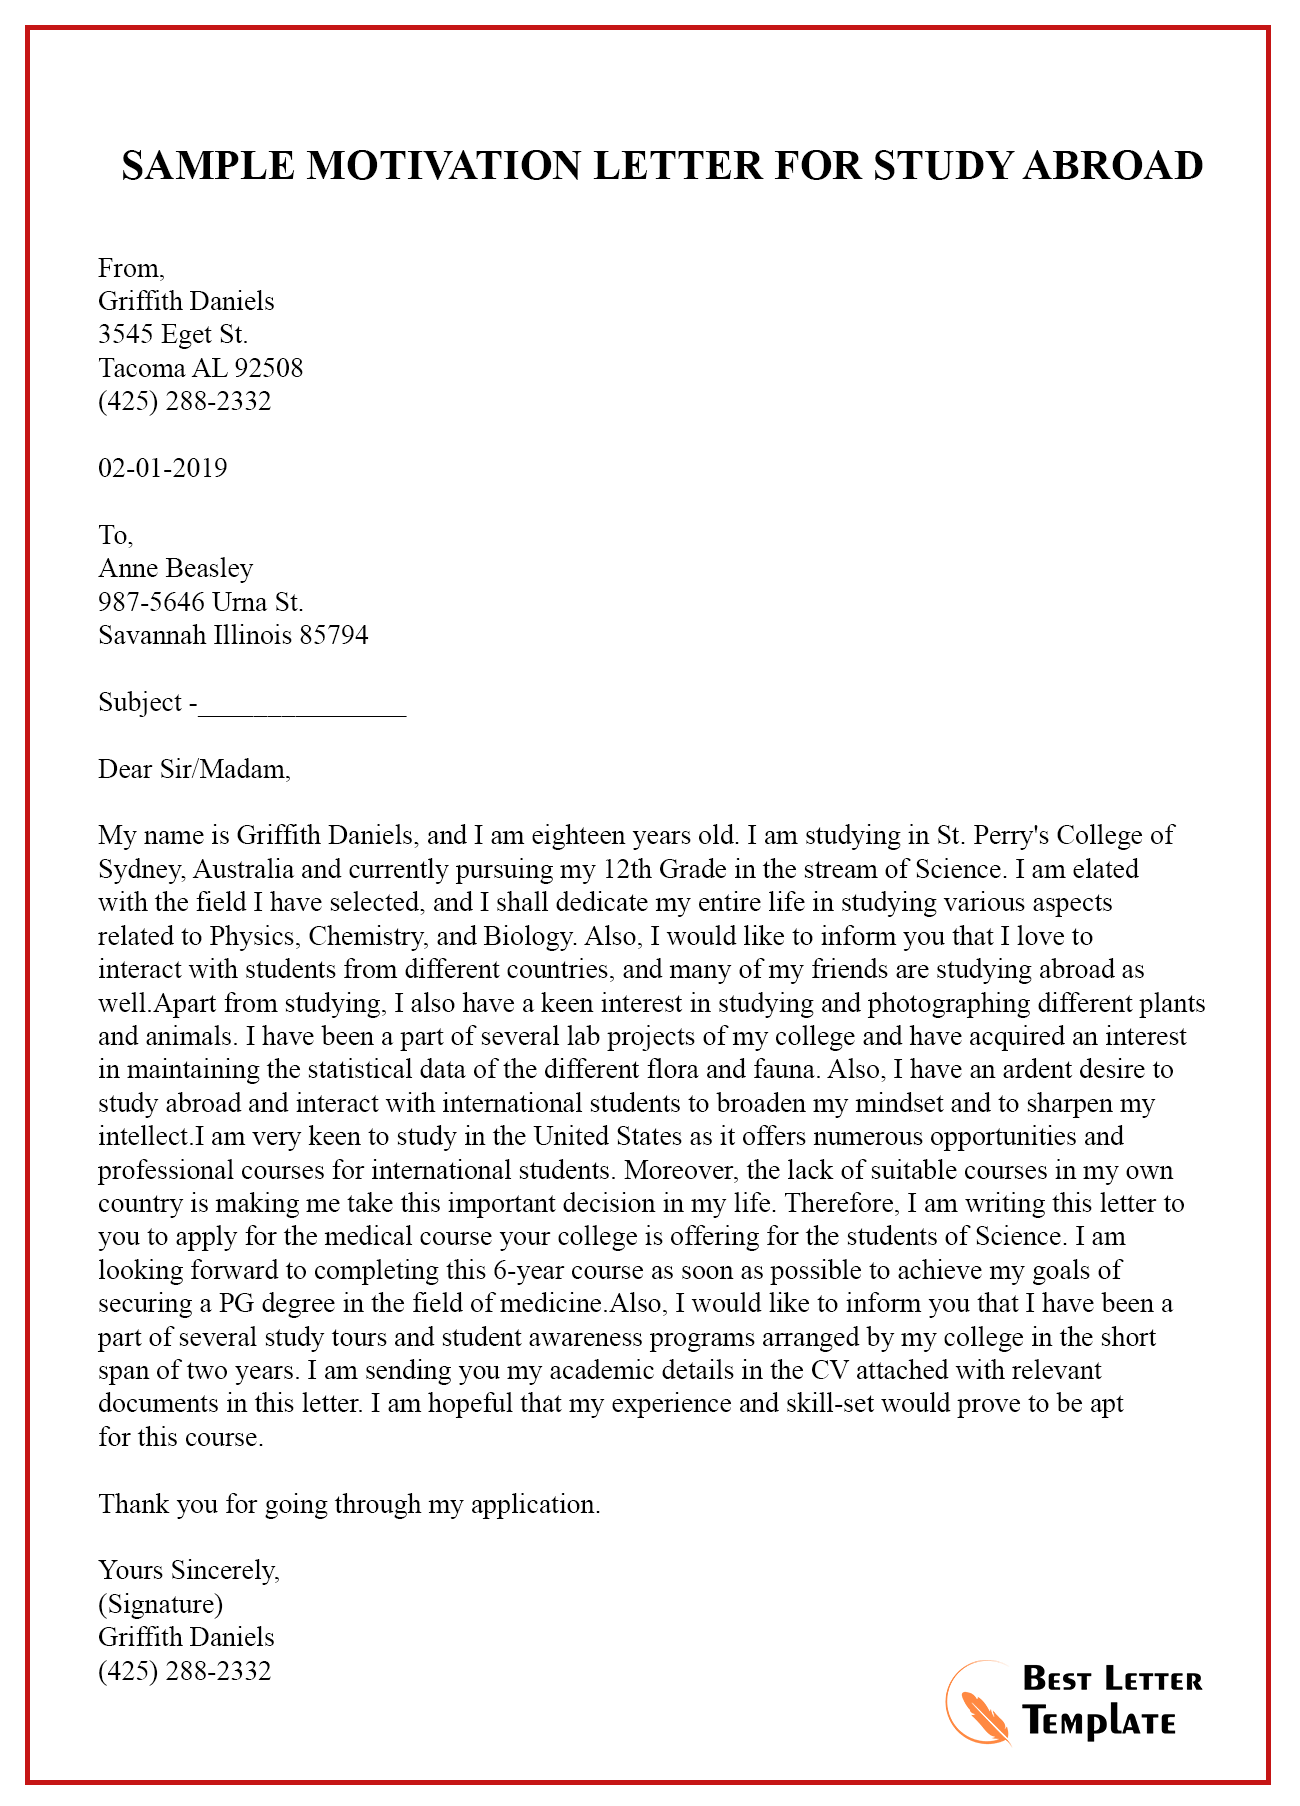 motivation letter example university admission  Sample Motivation Letter Template for Study Abroad – PDF ..